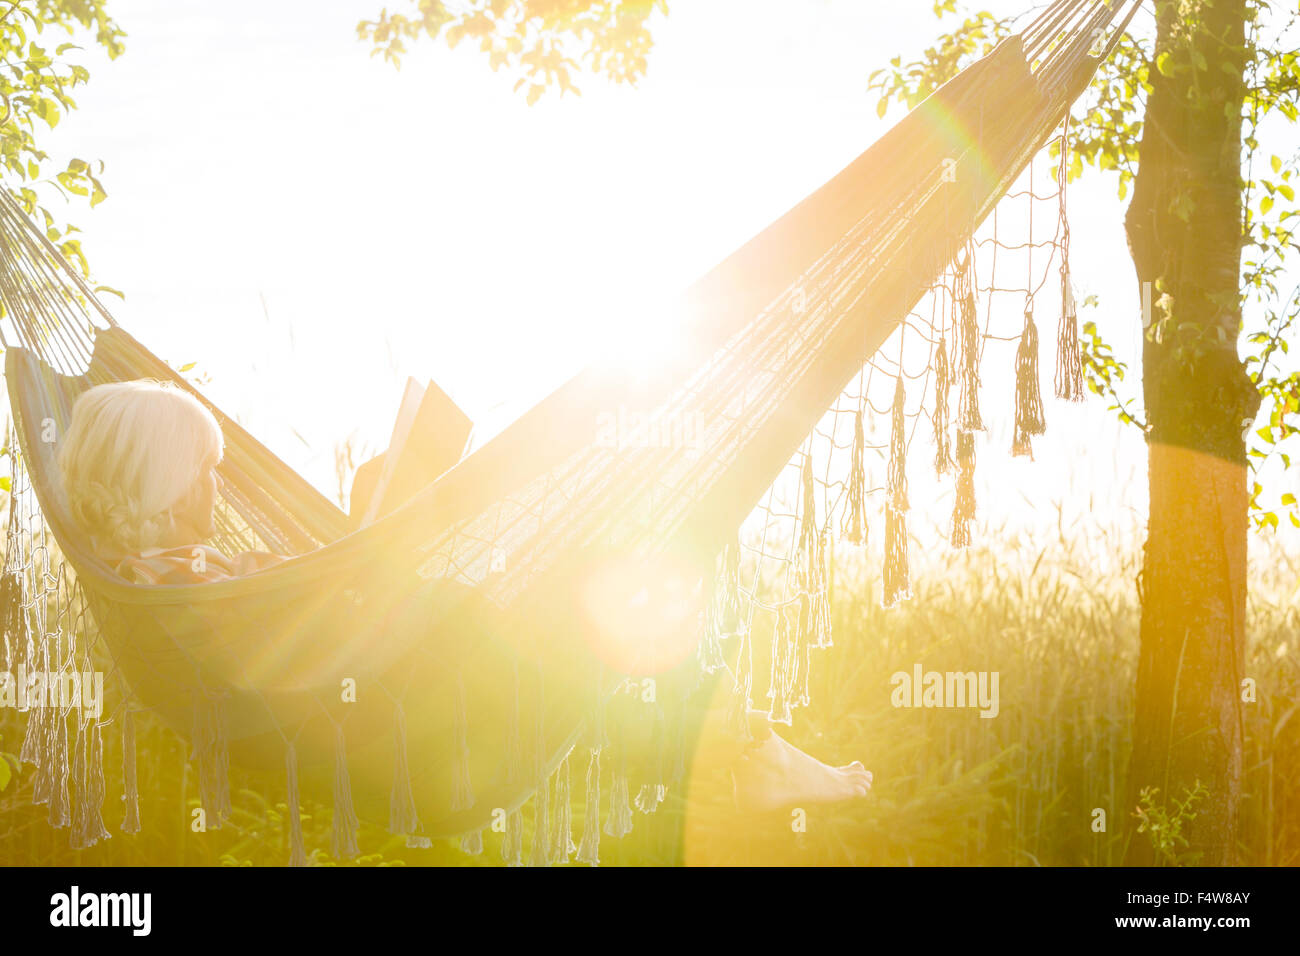 Serene woman reading book in sunny hammock - Stock Image